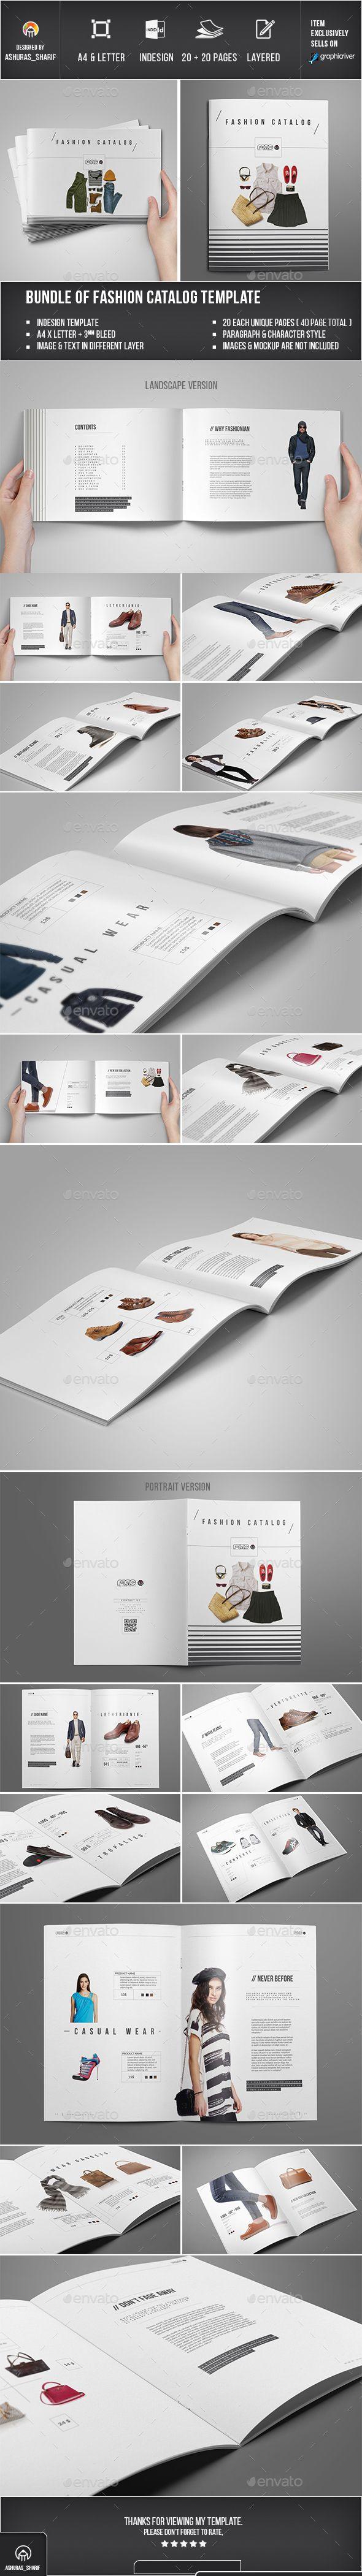 Product Catalog | Pinterest